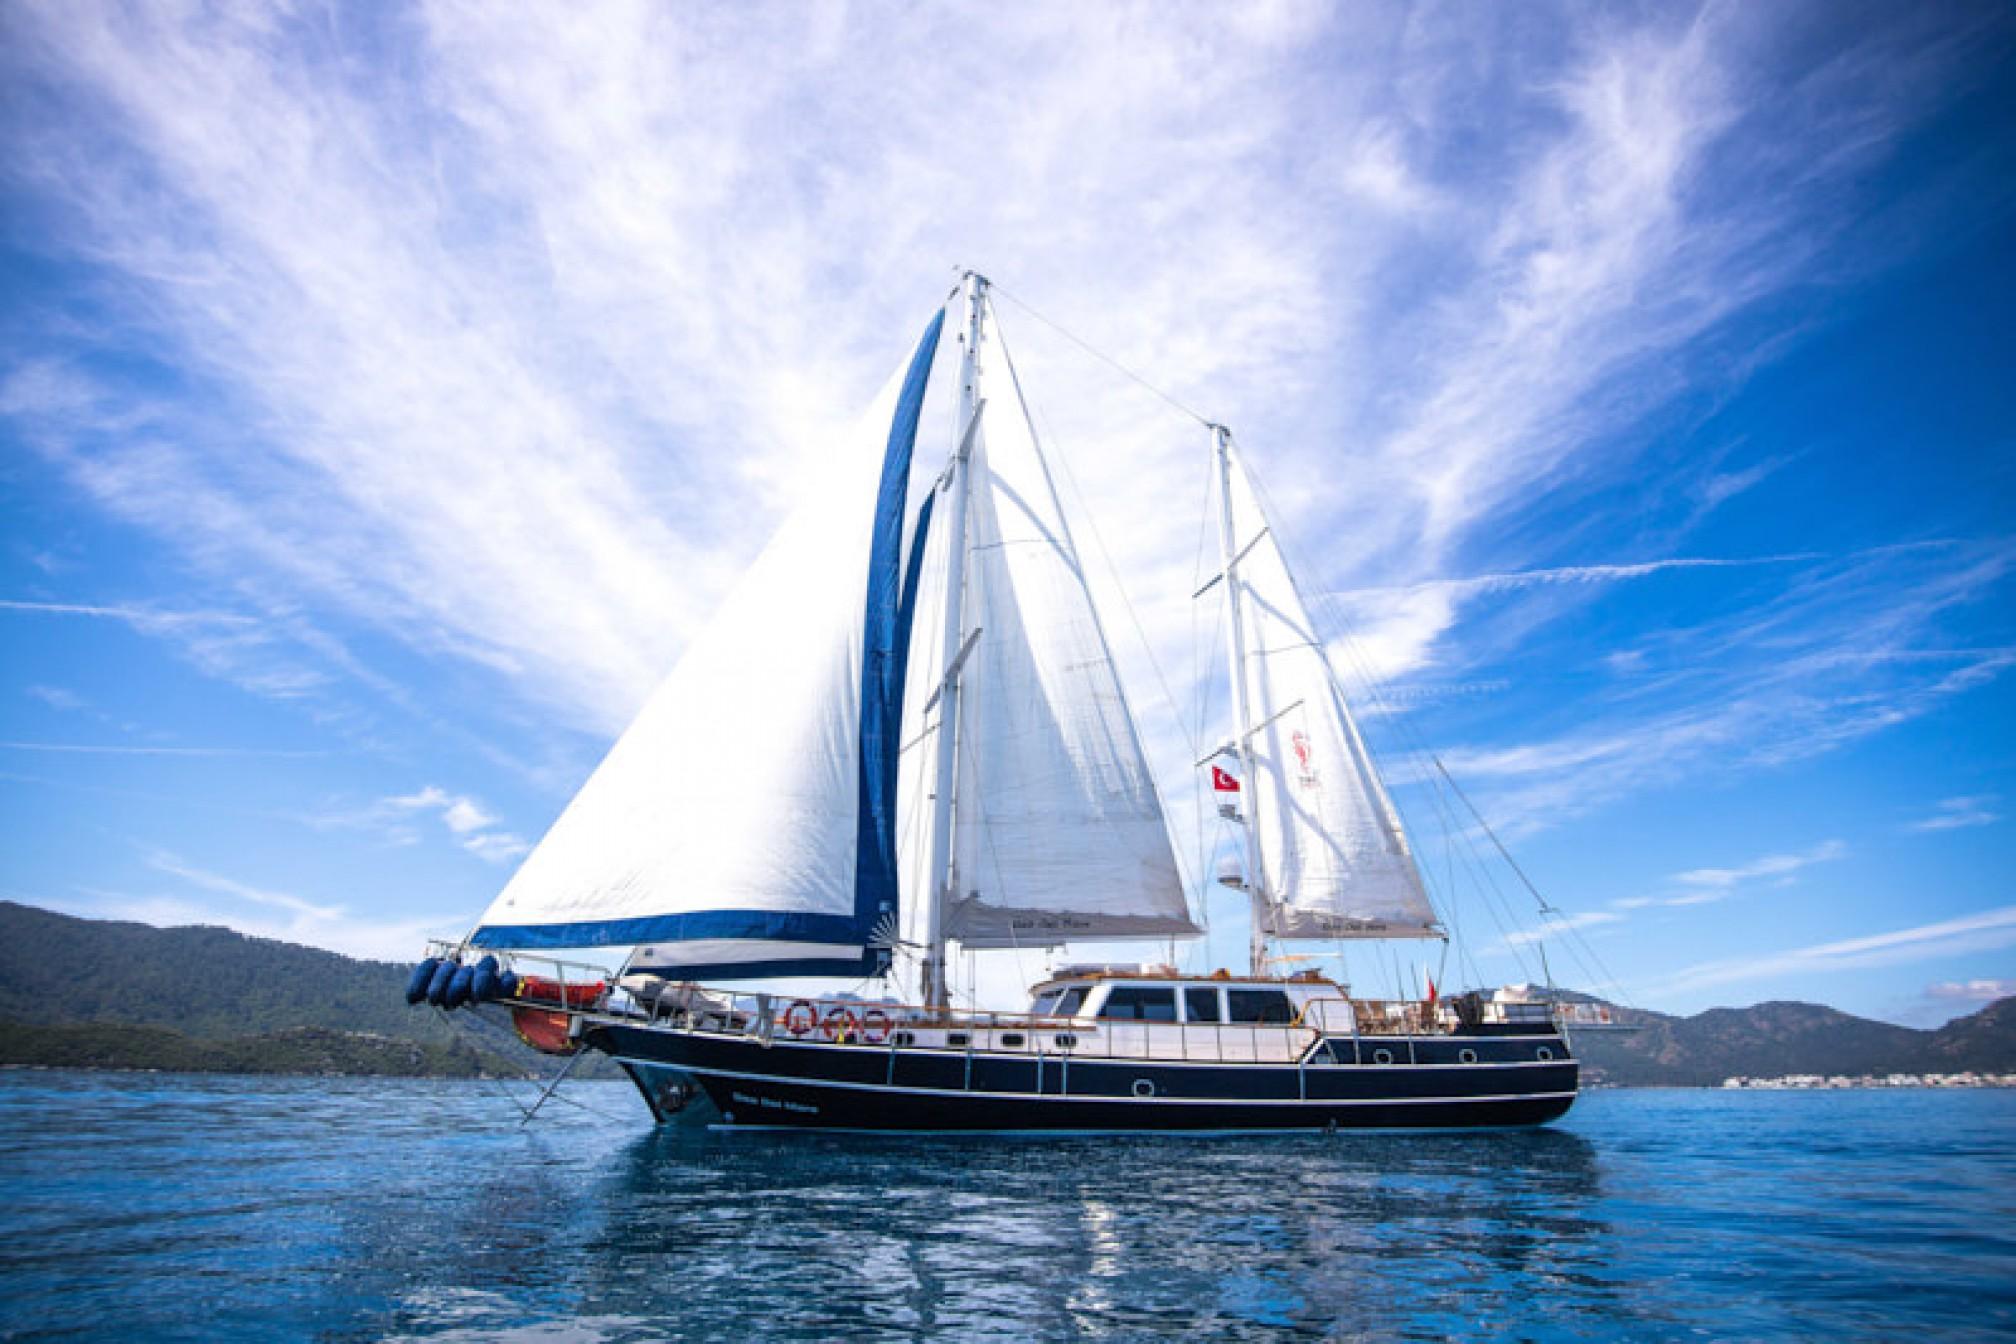 Rental gulet Dea Del Mare 10 pax sailing